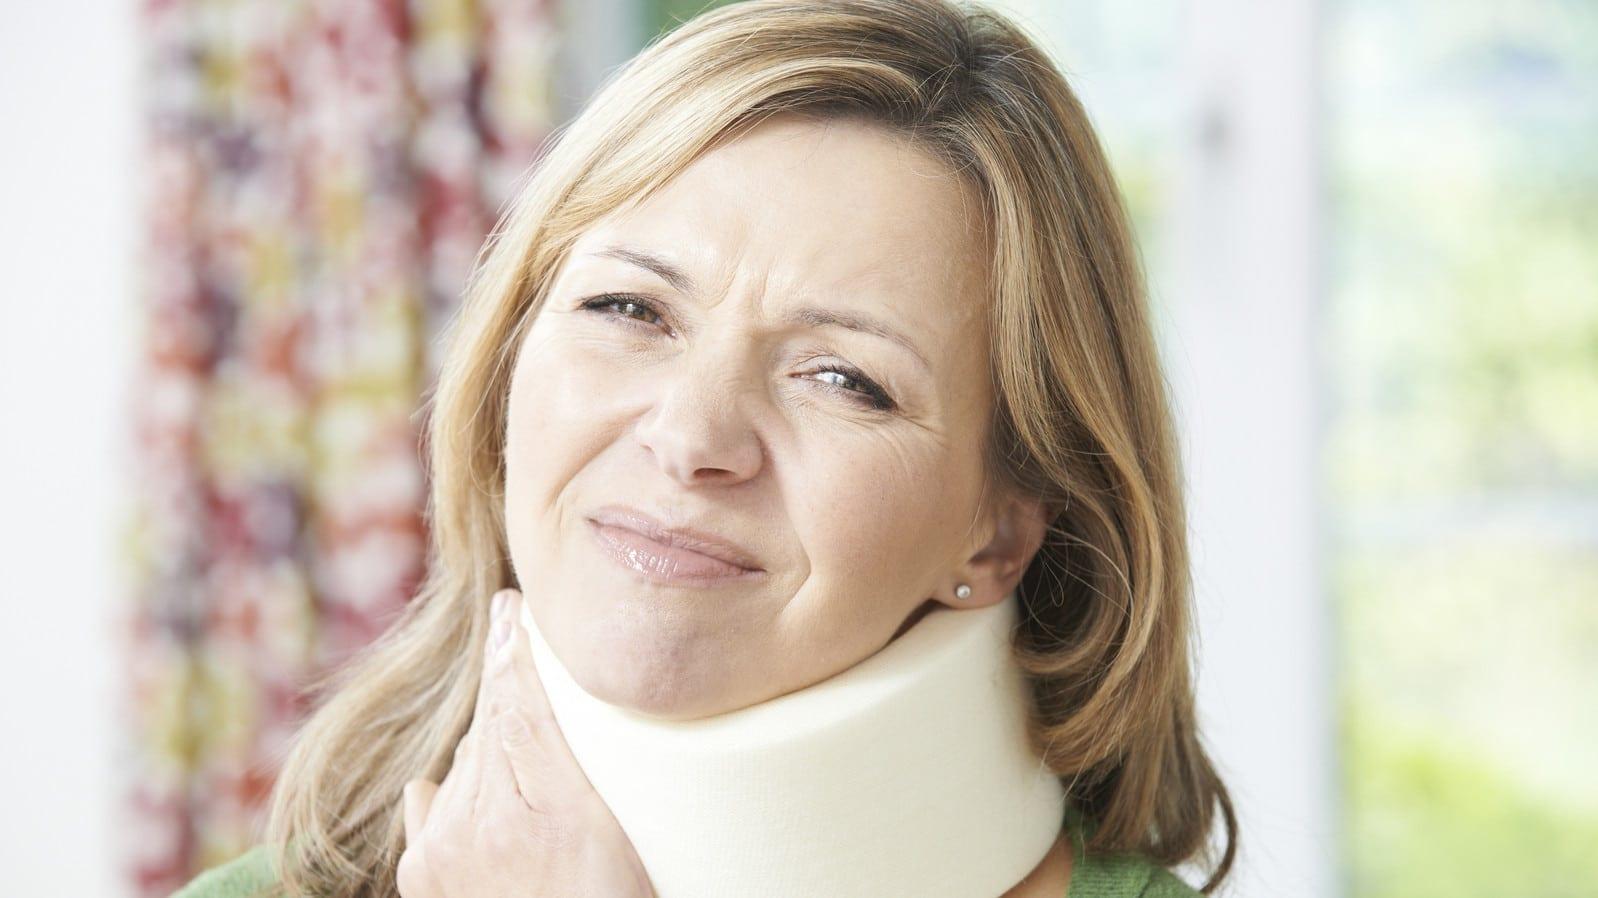 Woman In A Neck Brace Stock Photo